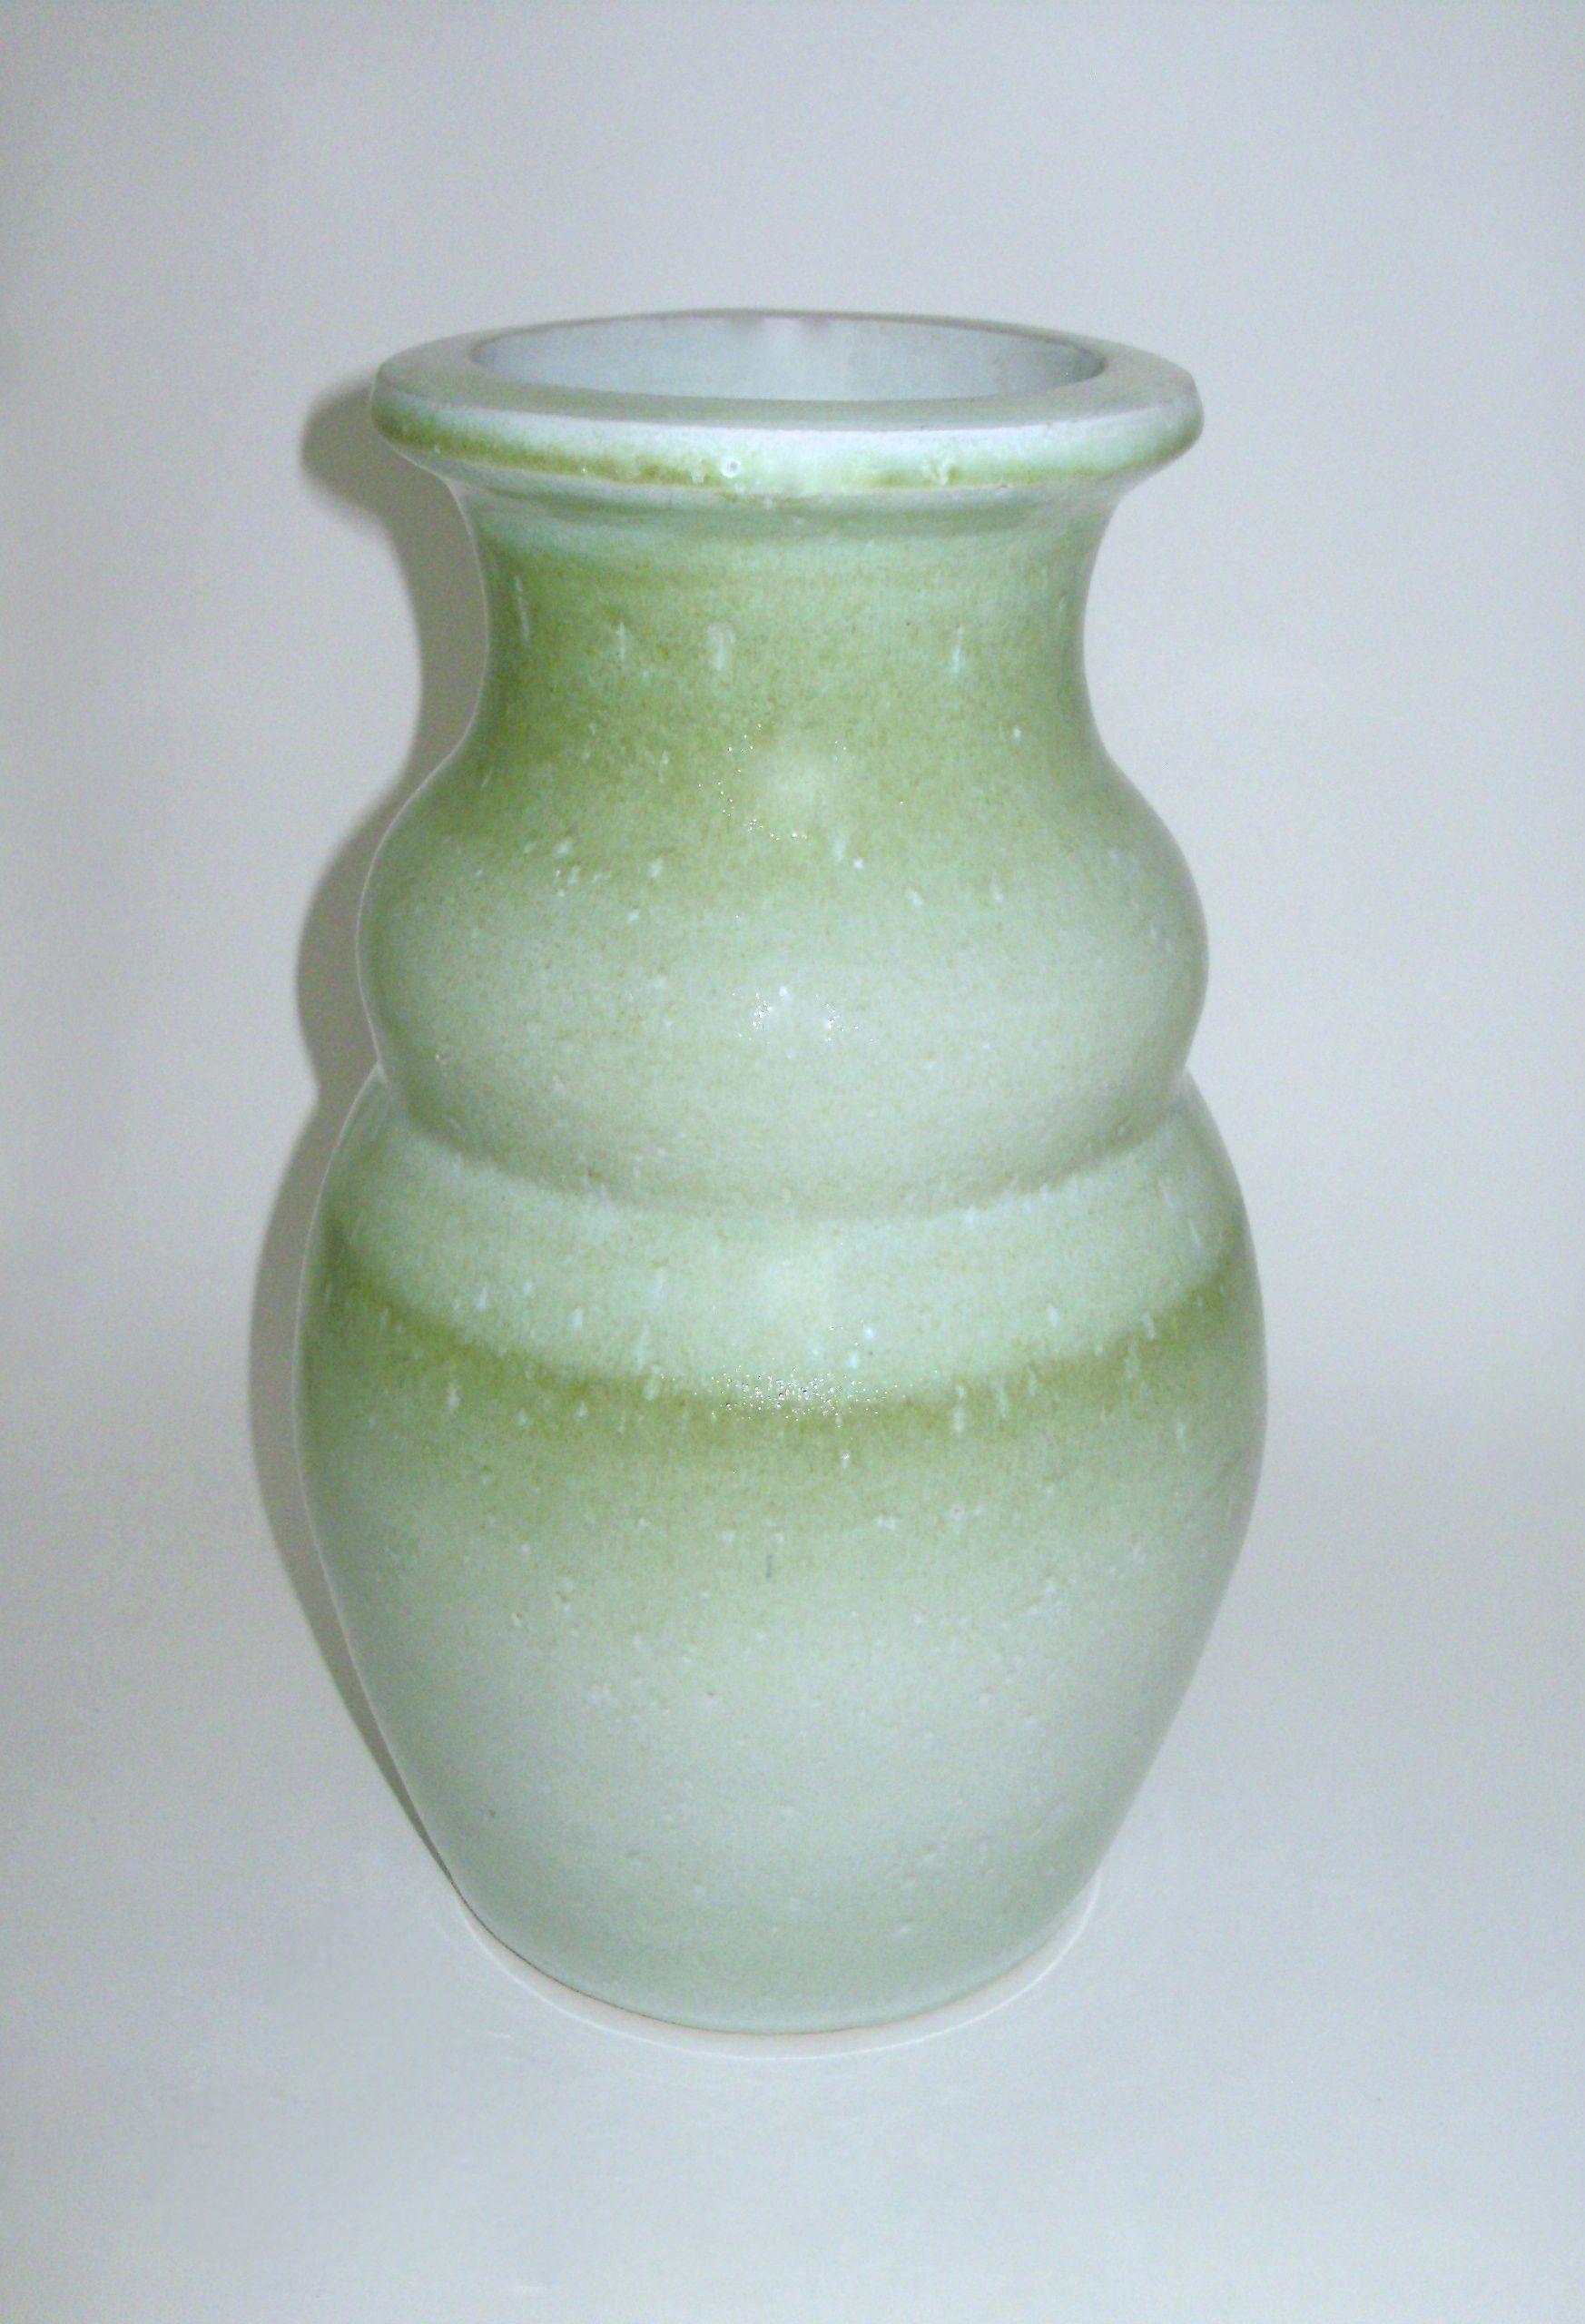 My Favorite Large Vase